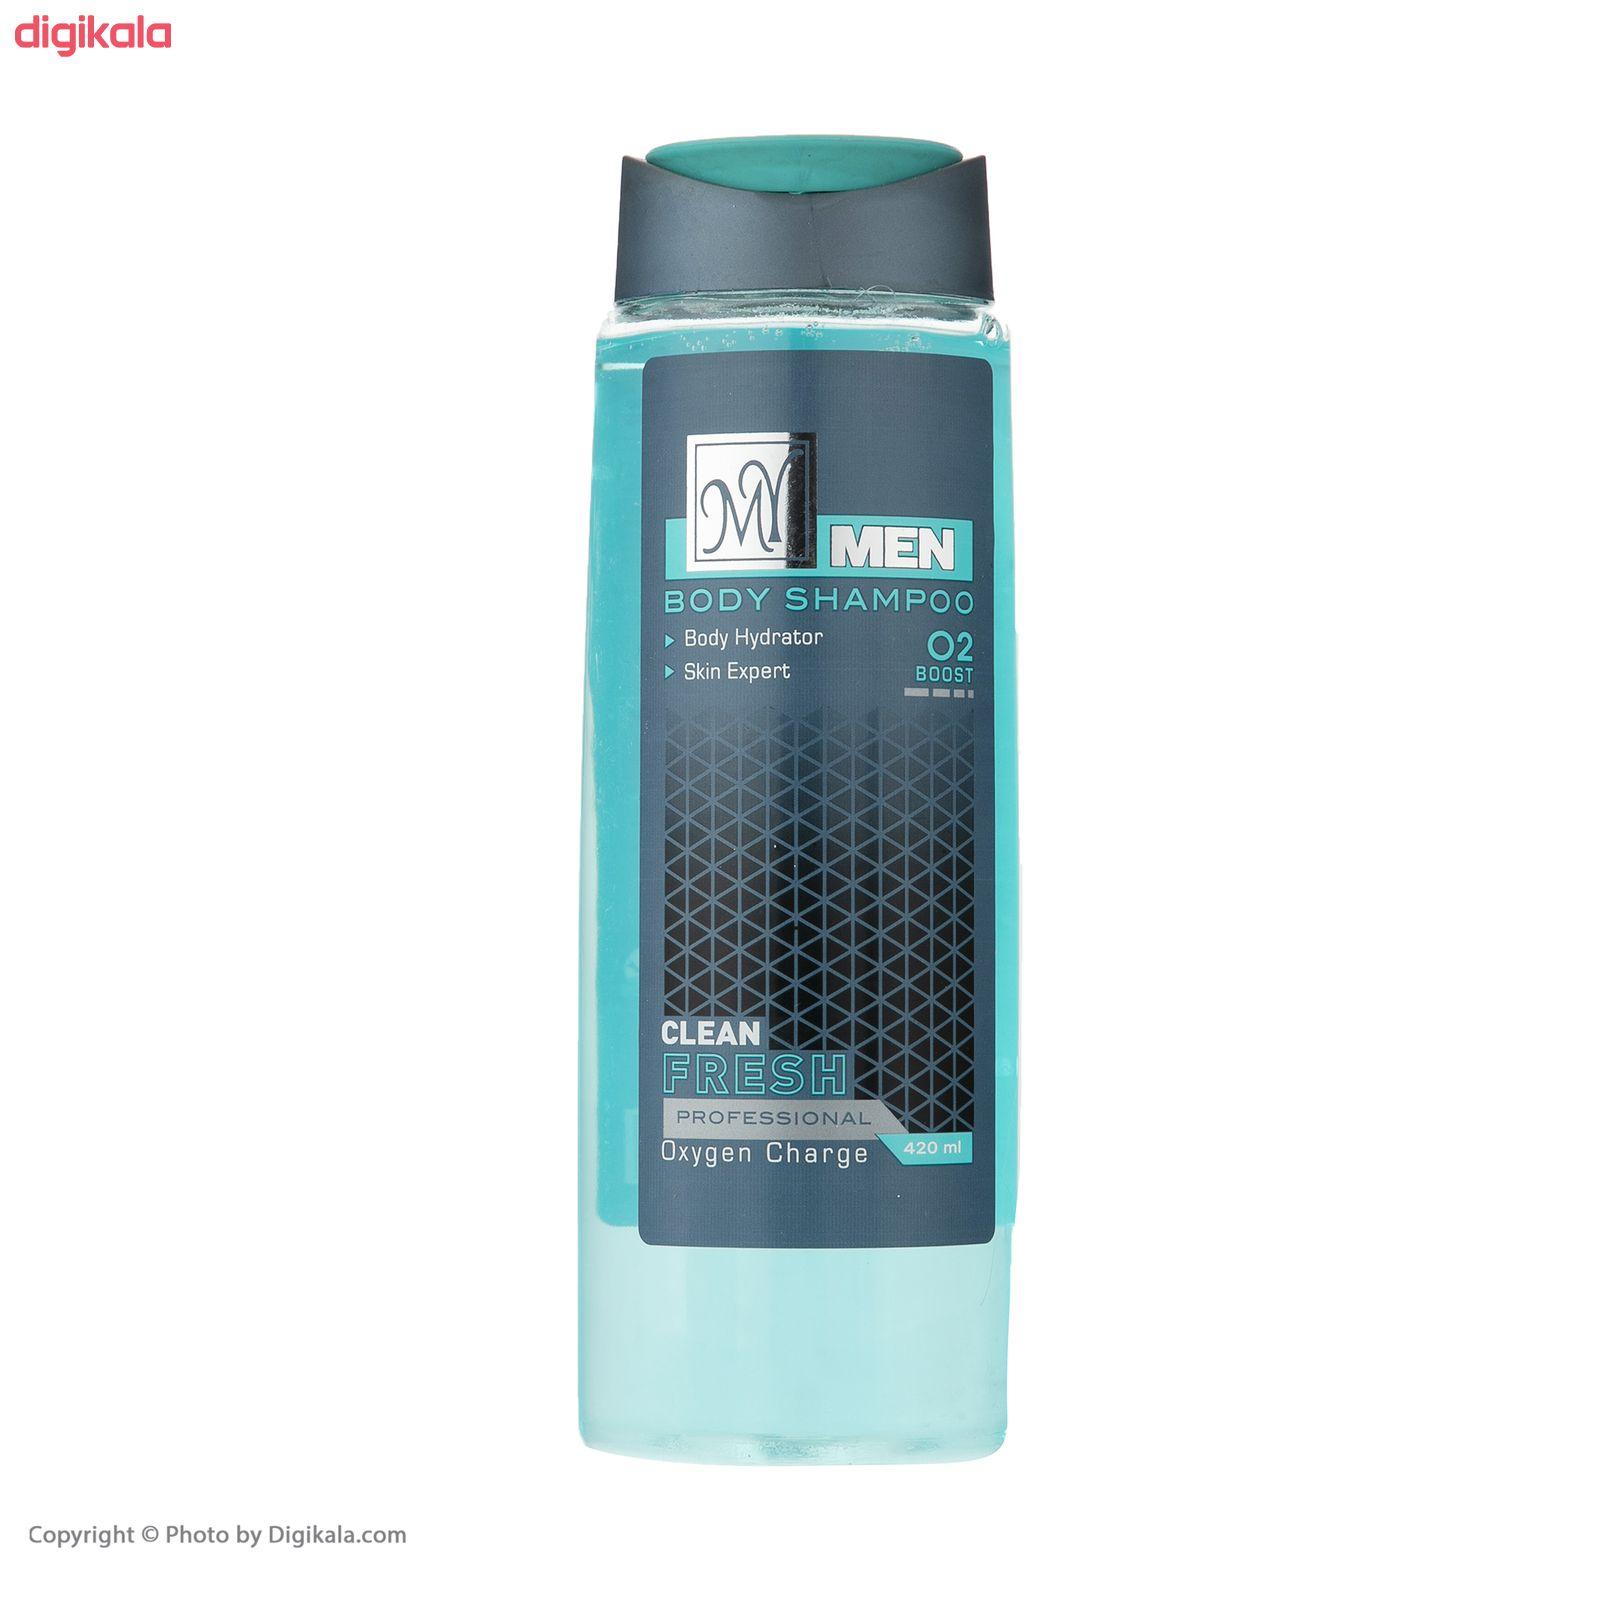 شامپو بدن مردانه مای مدل Clean Fresh حجم 420 میلی لیتر main 1 3